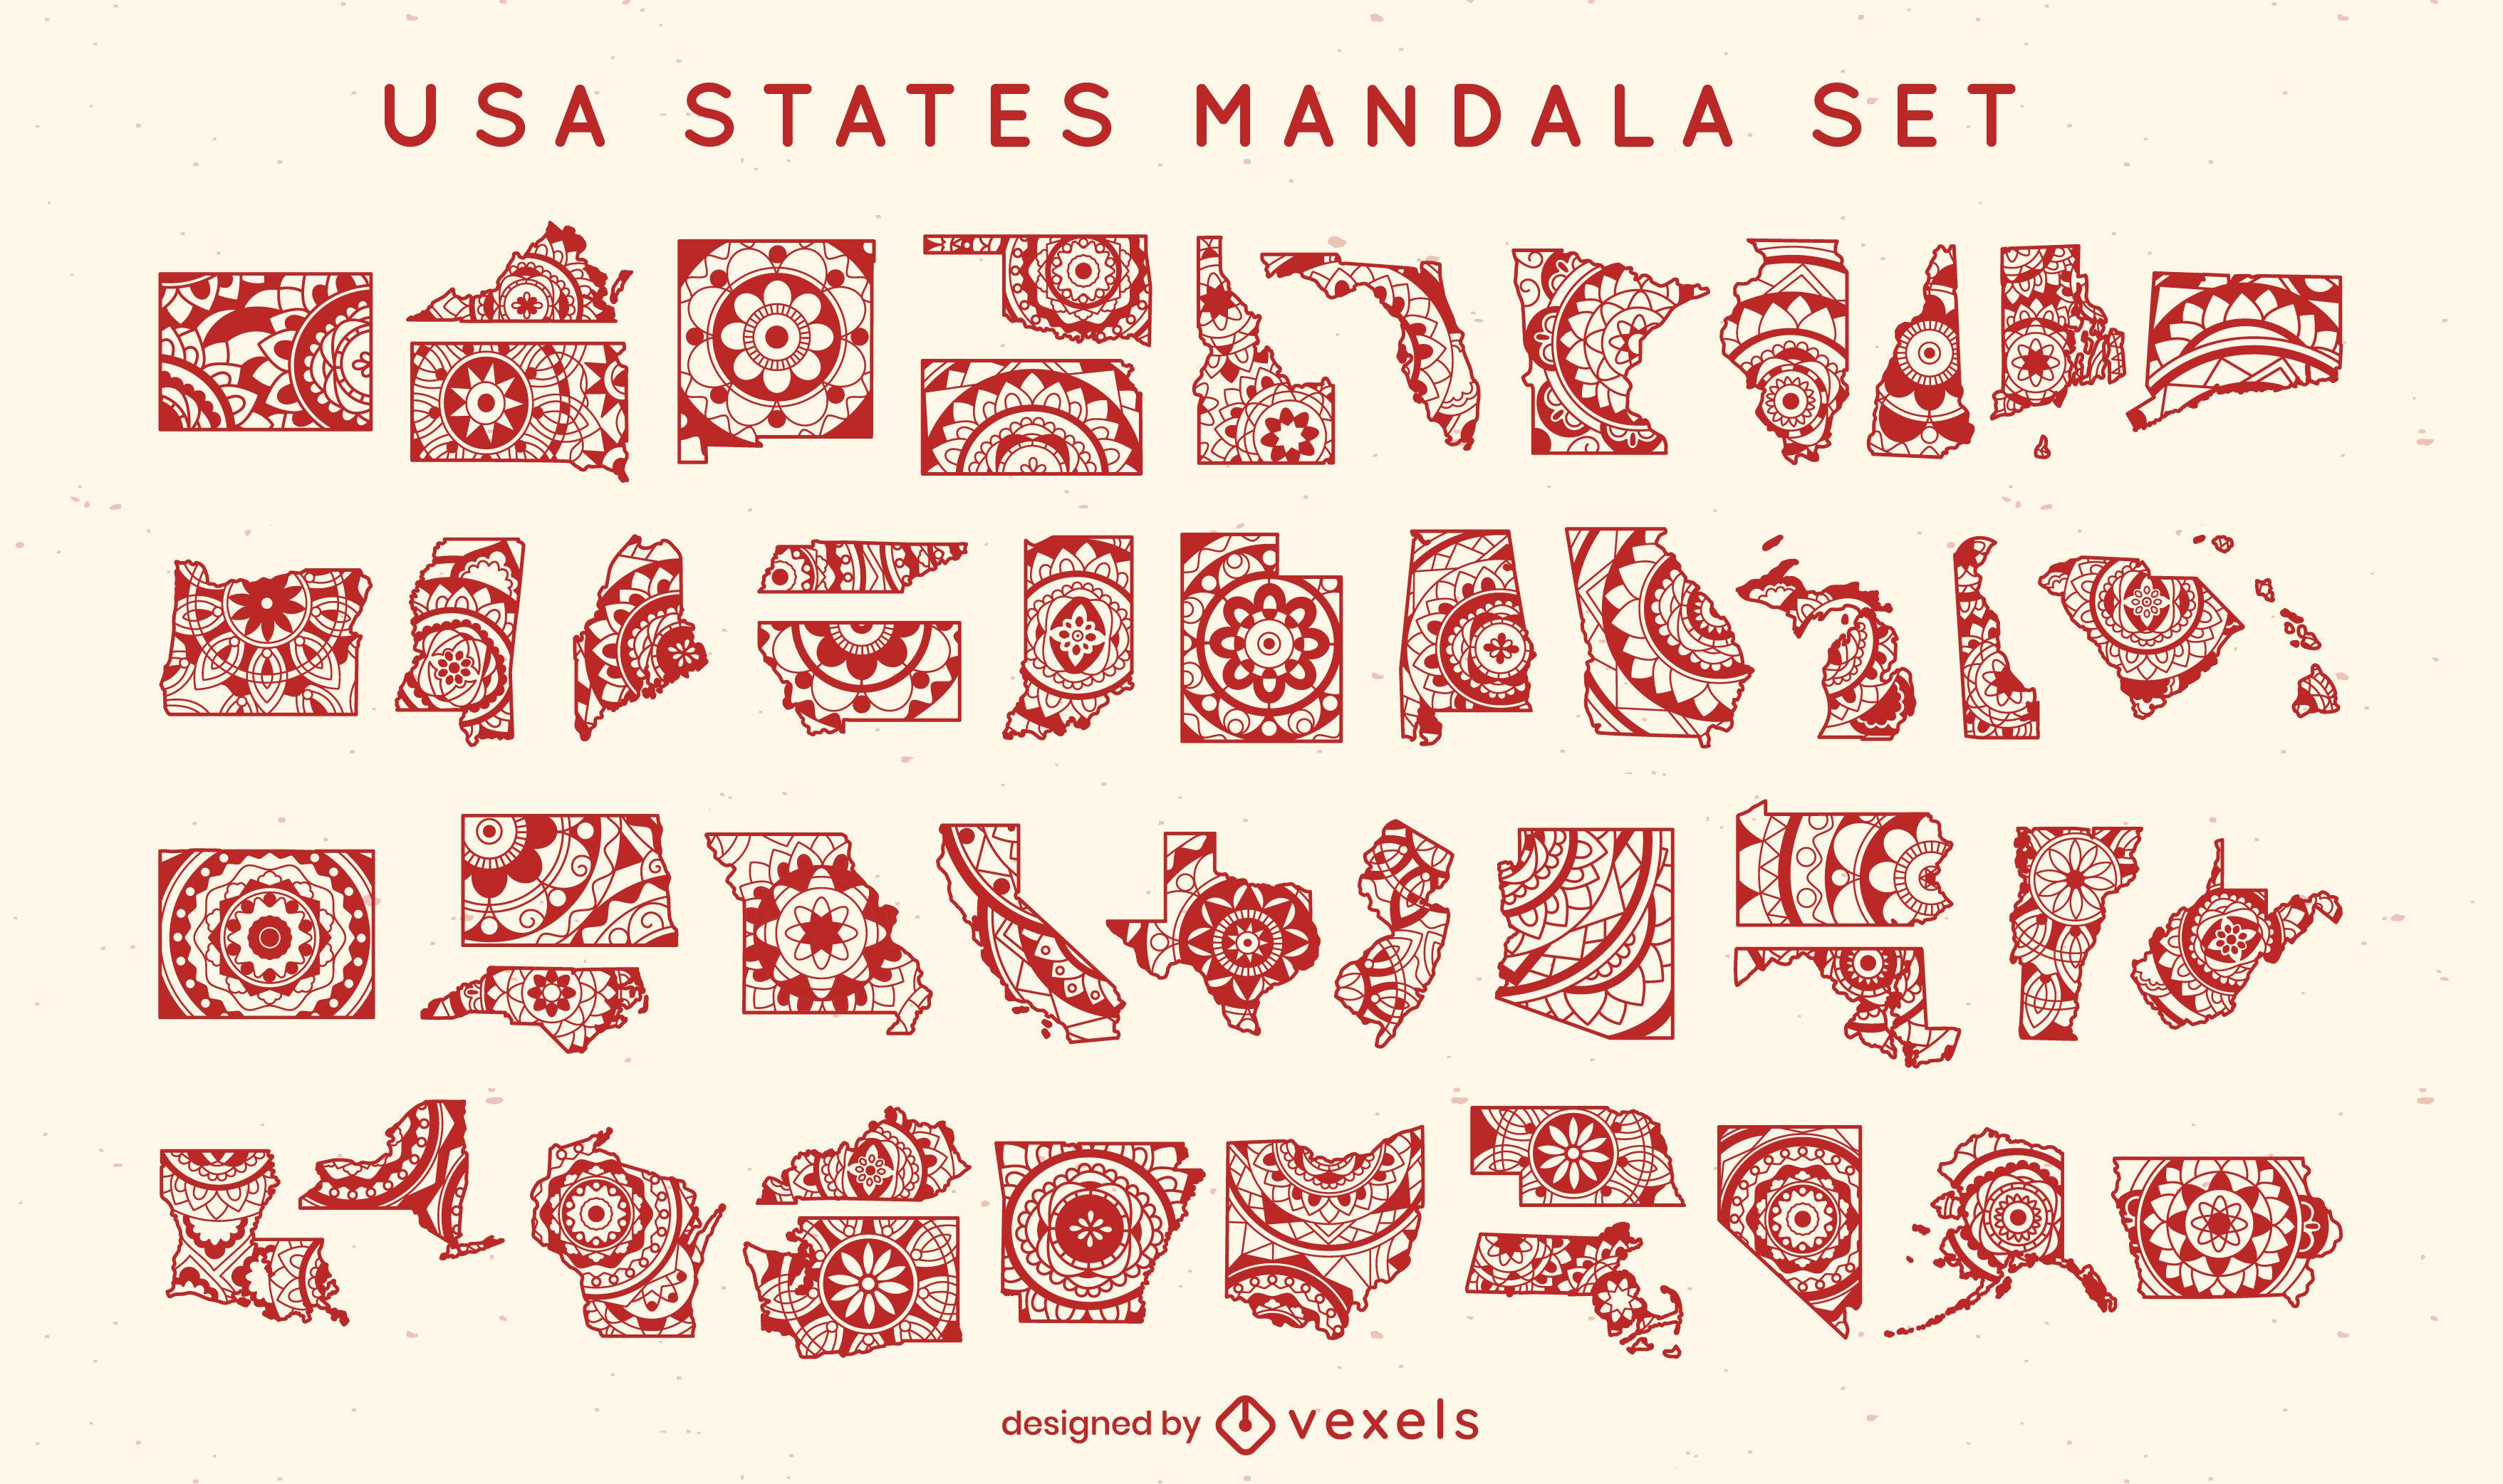 Staaten des US-Mandala-Sets